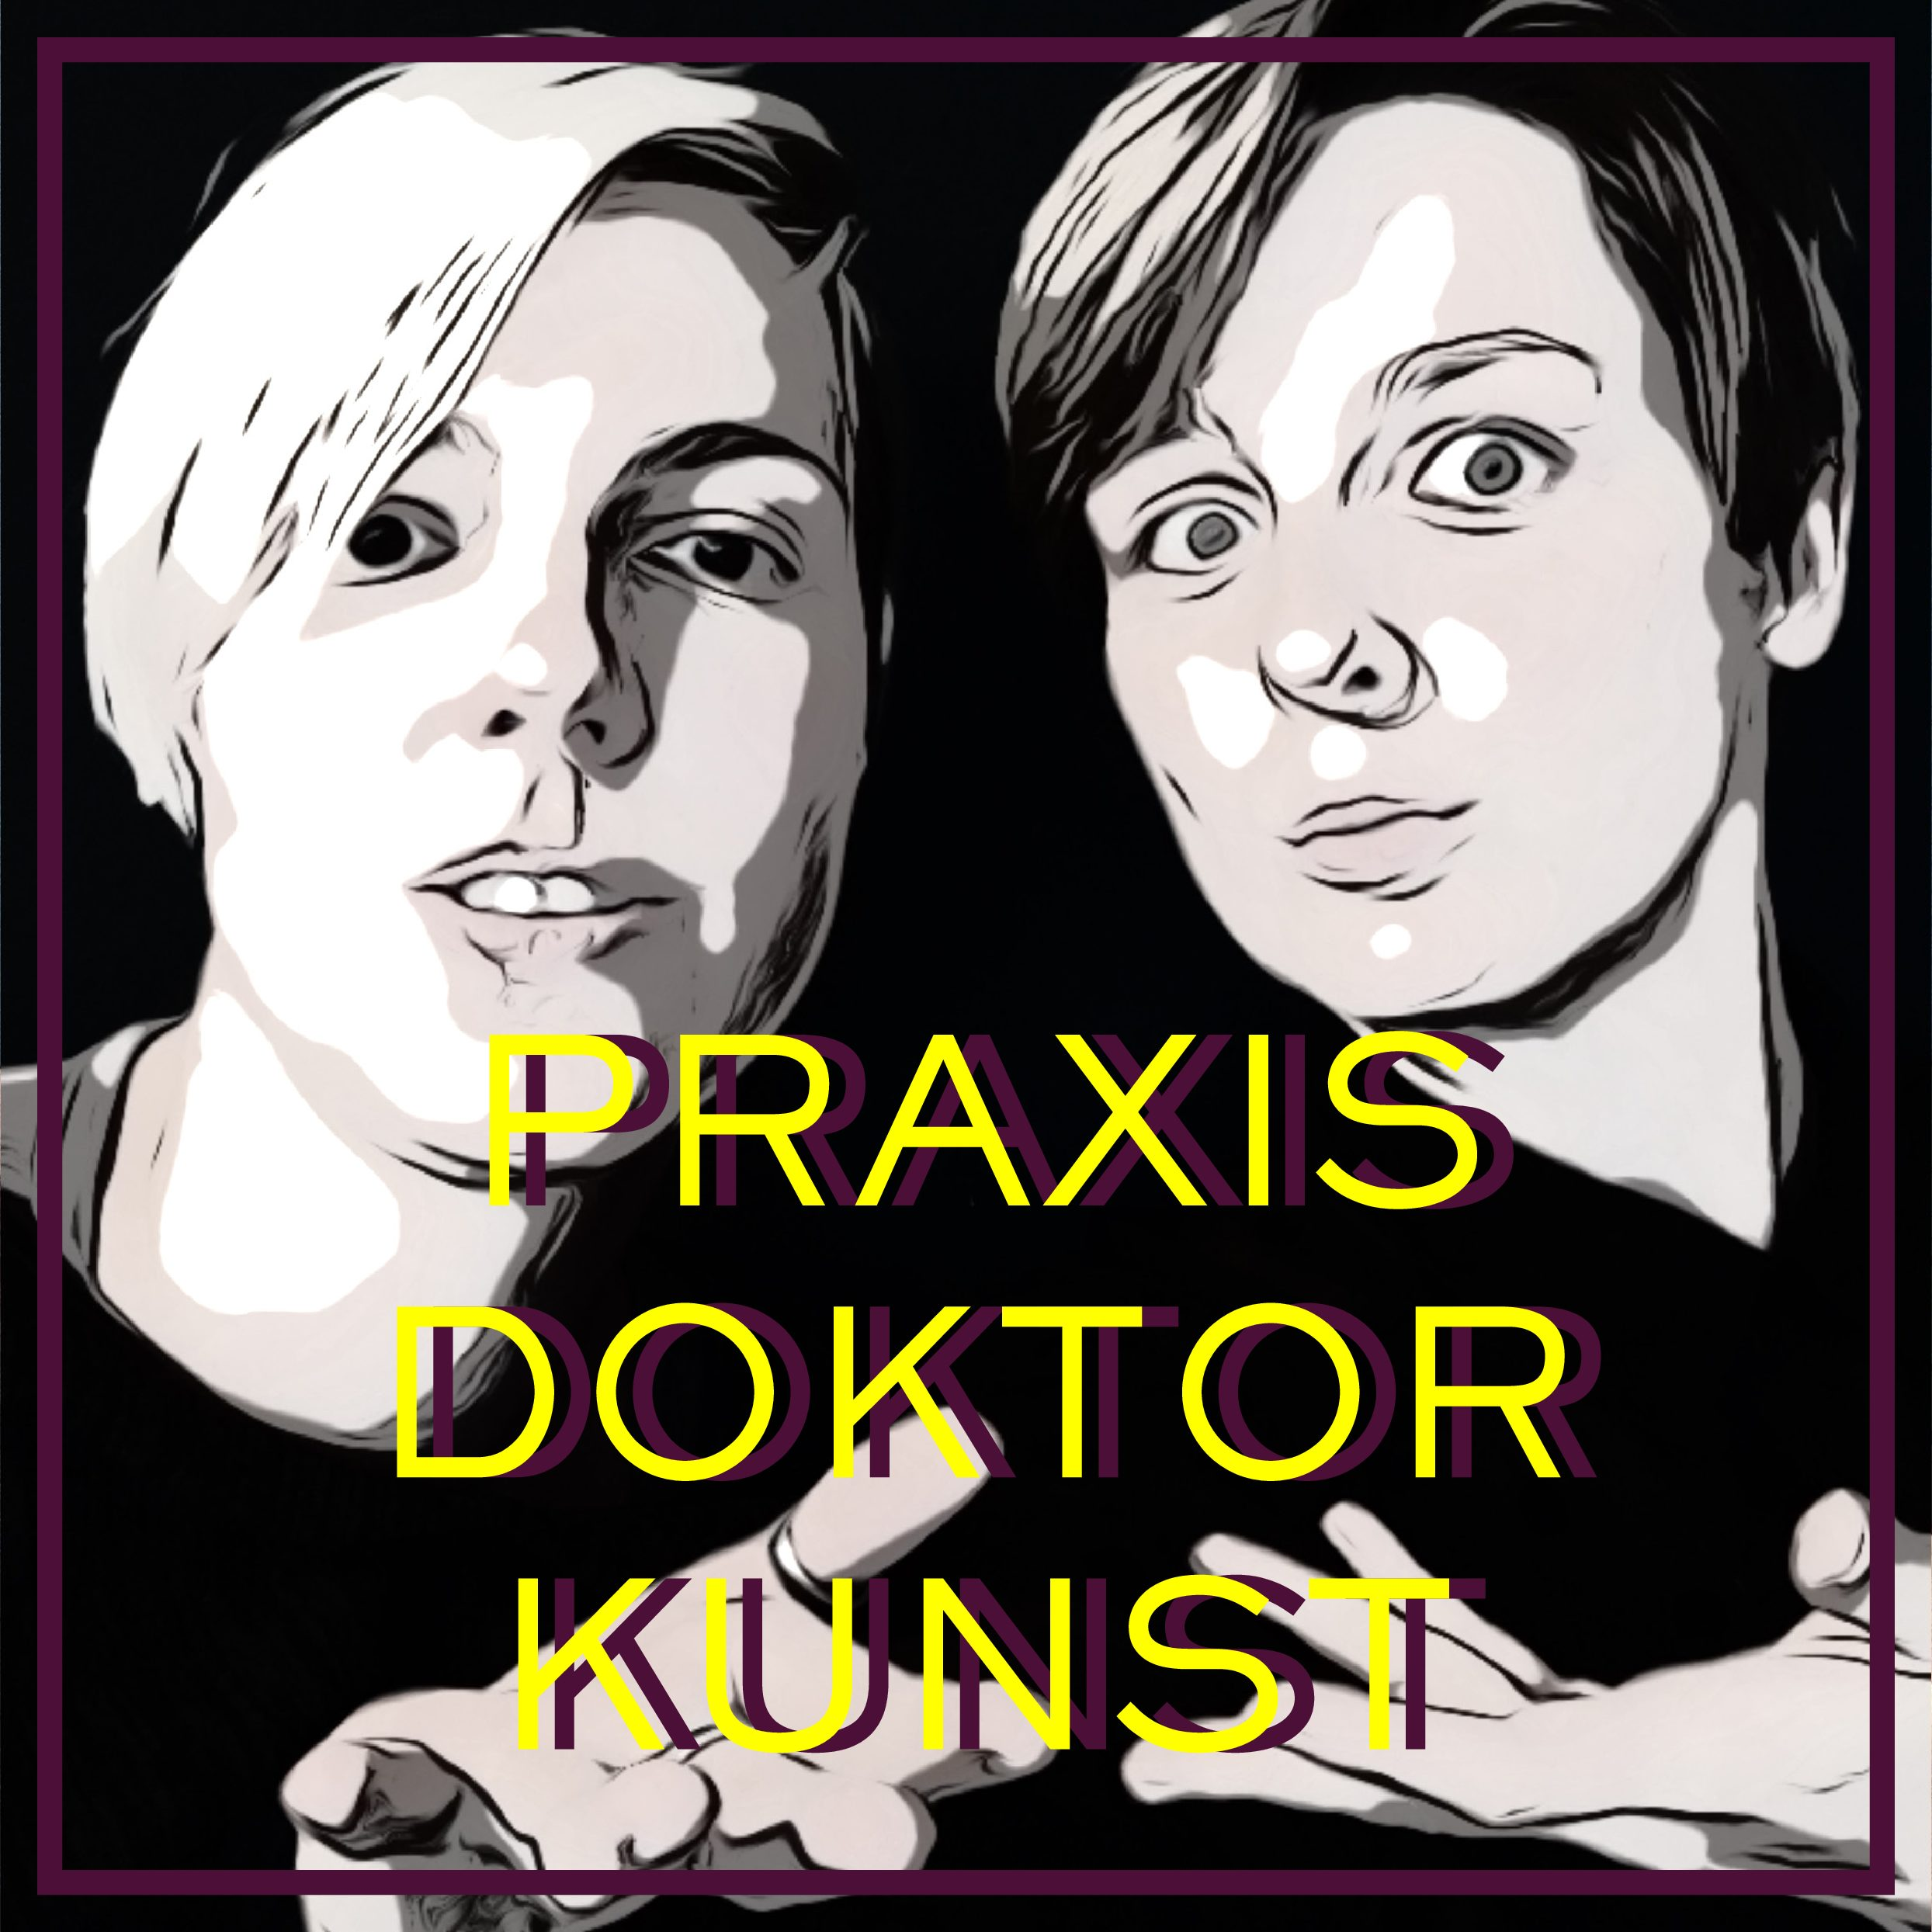 Eventbild für Lisa Tschorn und Beate Körner /// Praxis Doktor Kunst